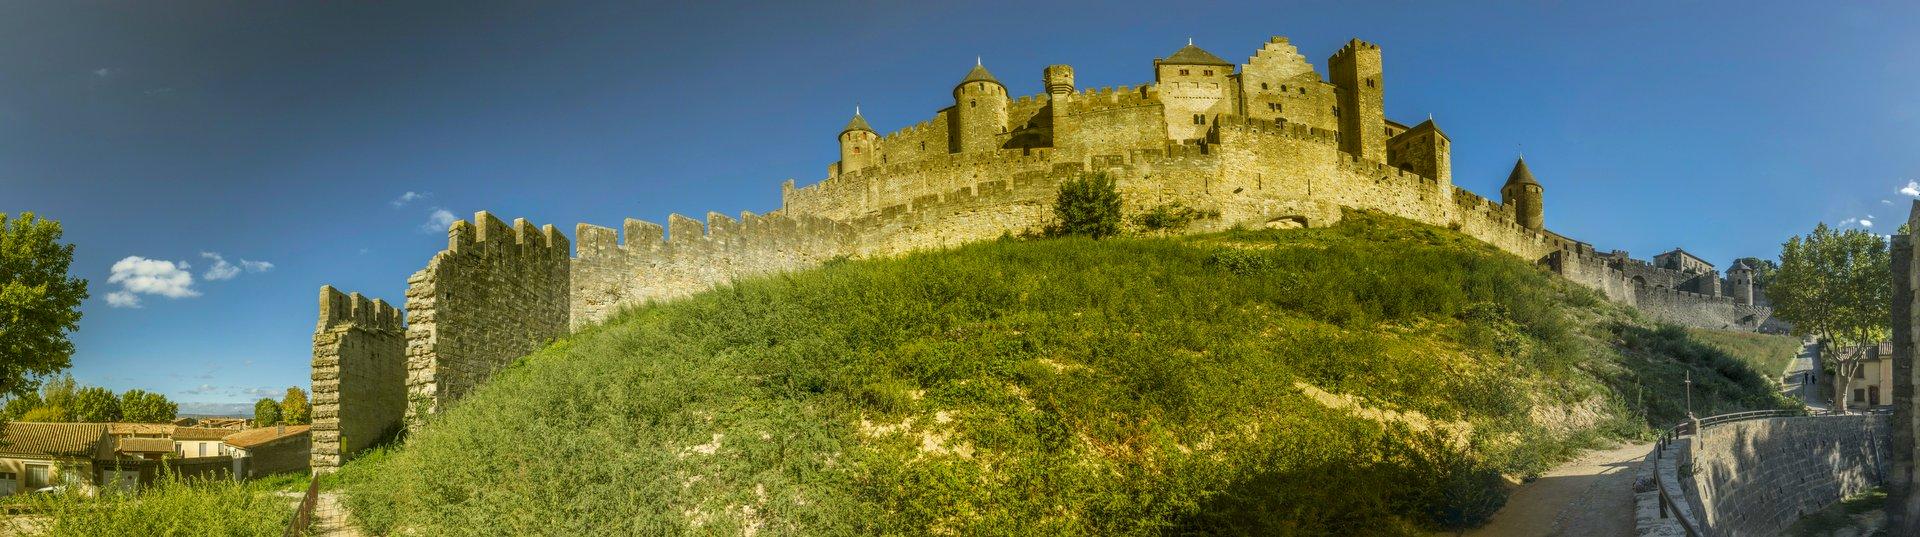 Panorama vom Château Comtal in der Cité Carcassonne